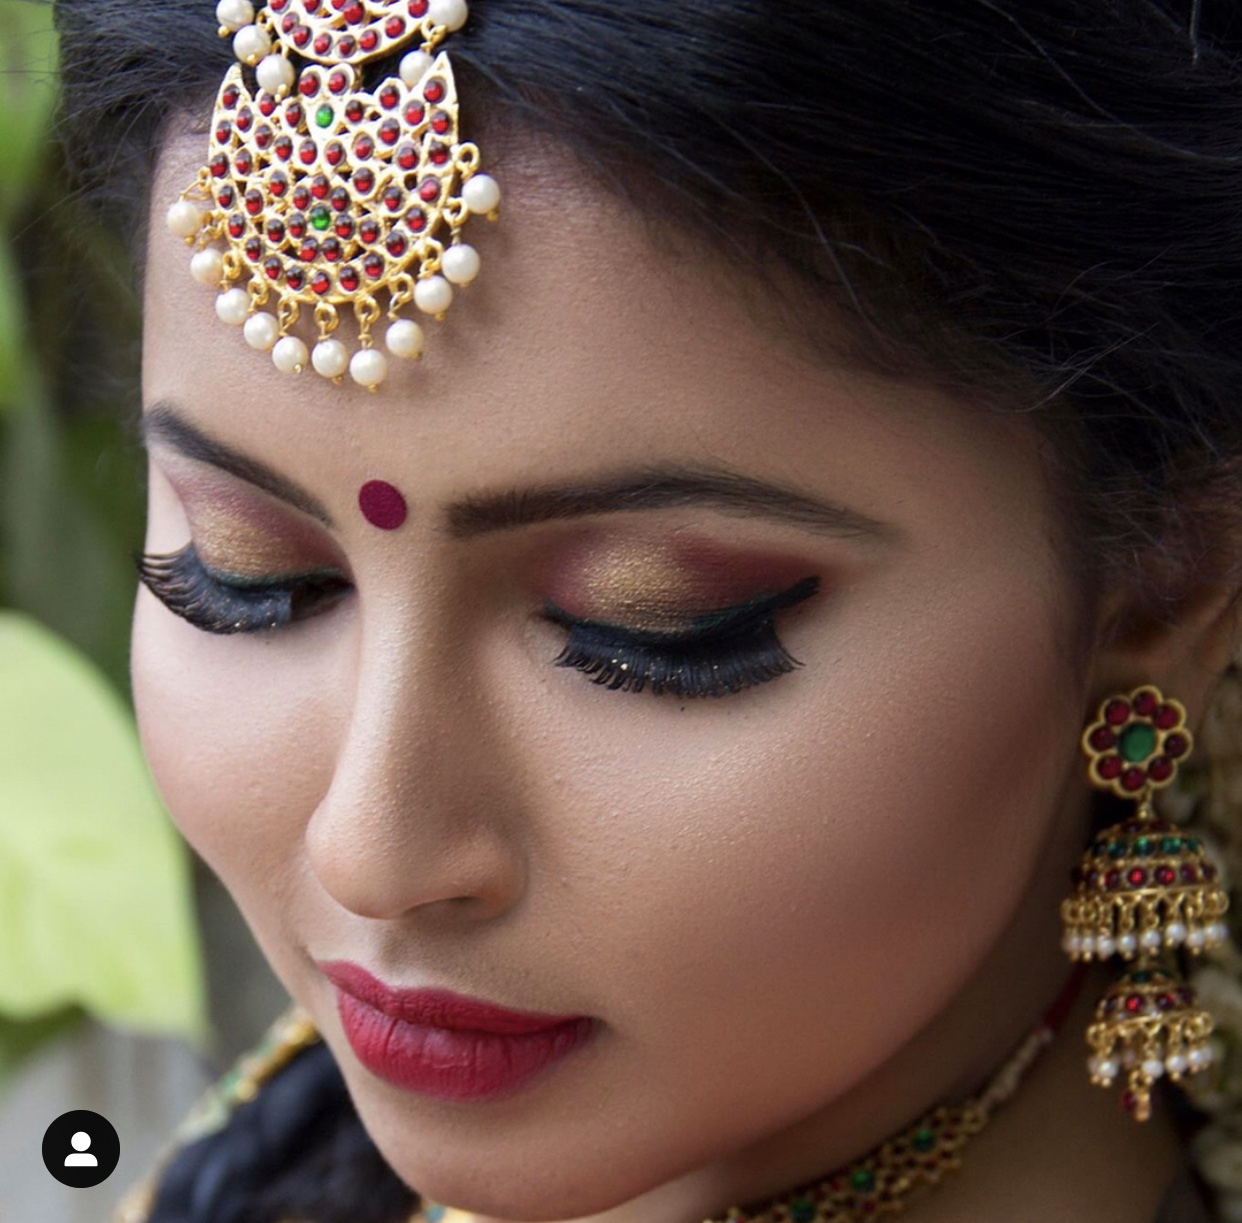 raini-sharma-makeup-artist-delhi-ncr